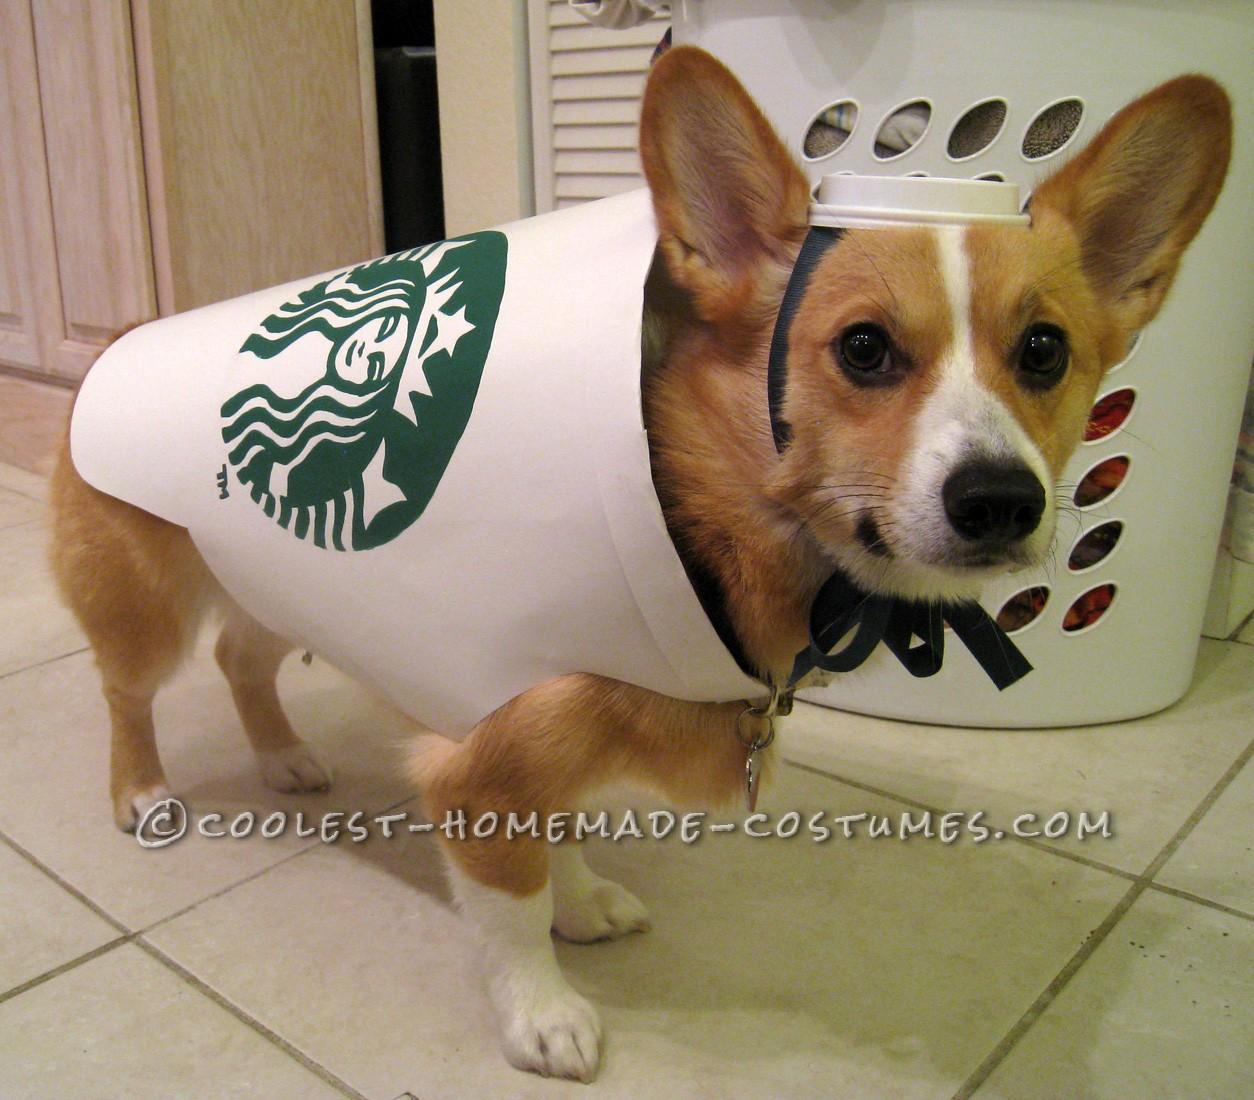 Starbucks Dog Costume - Easy and Inexpensive